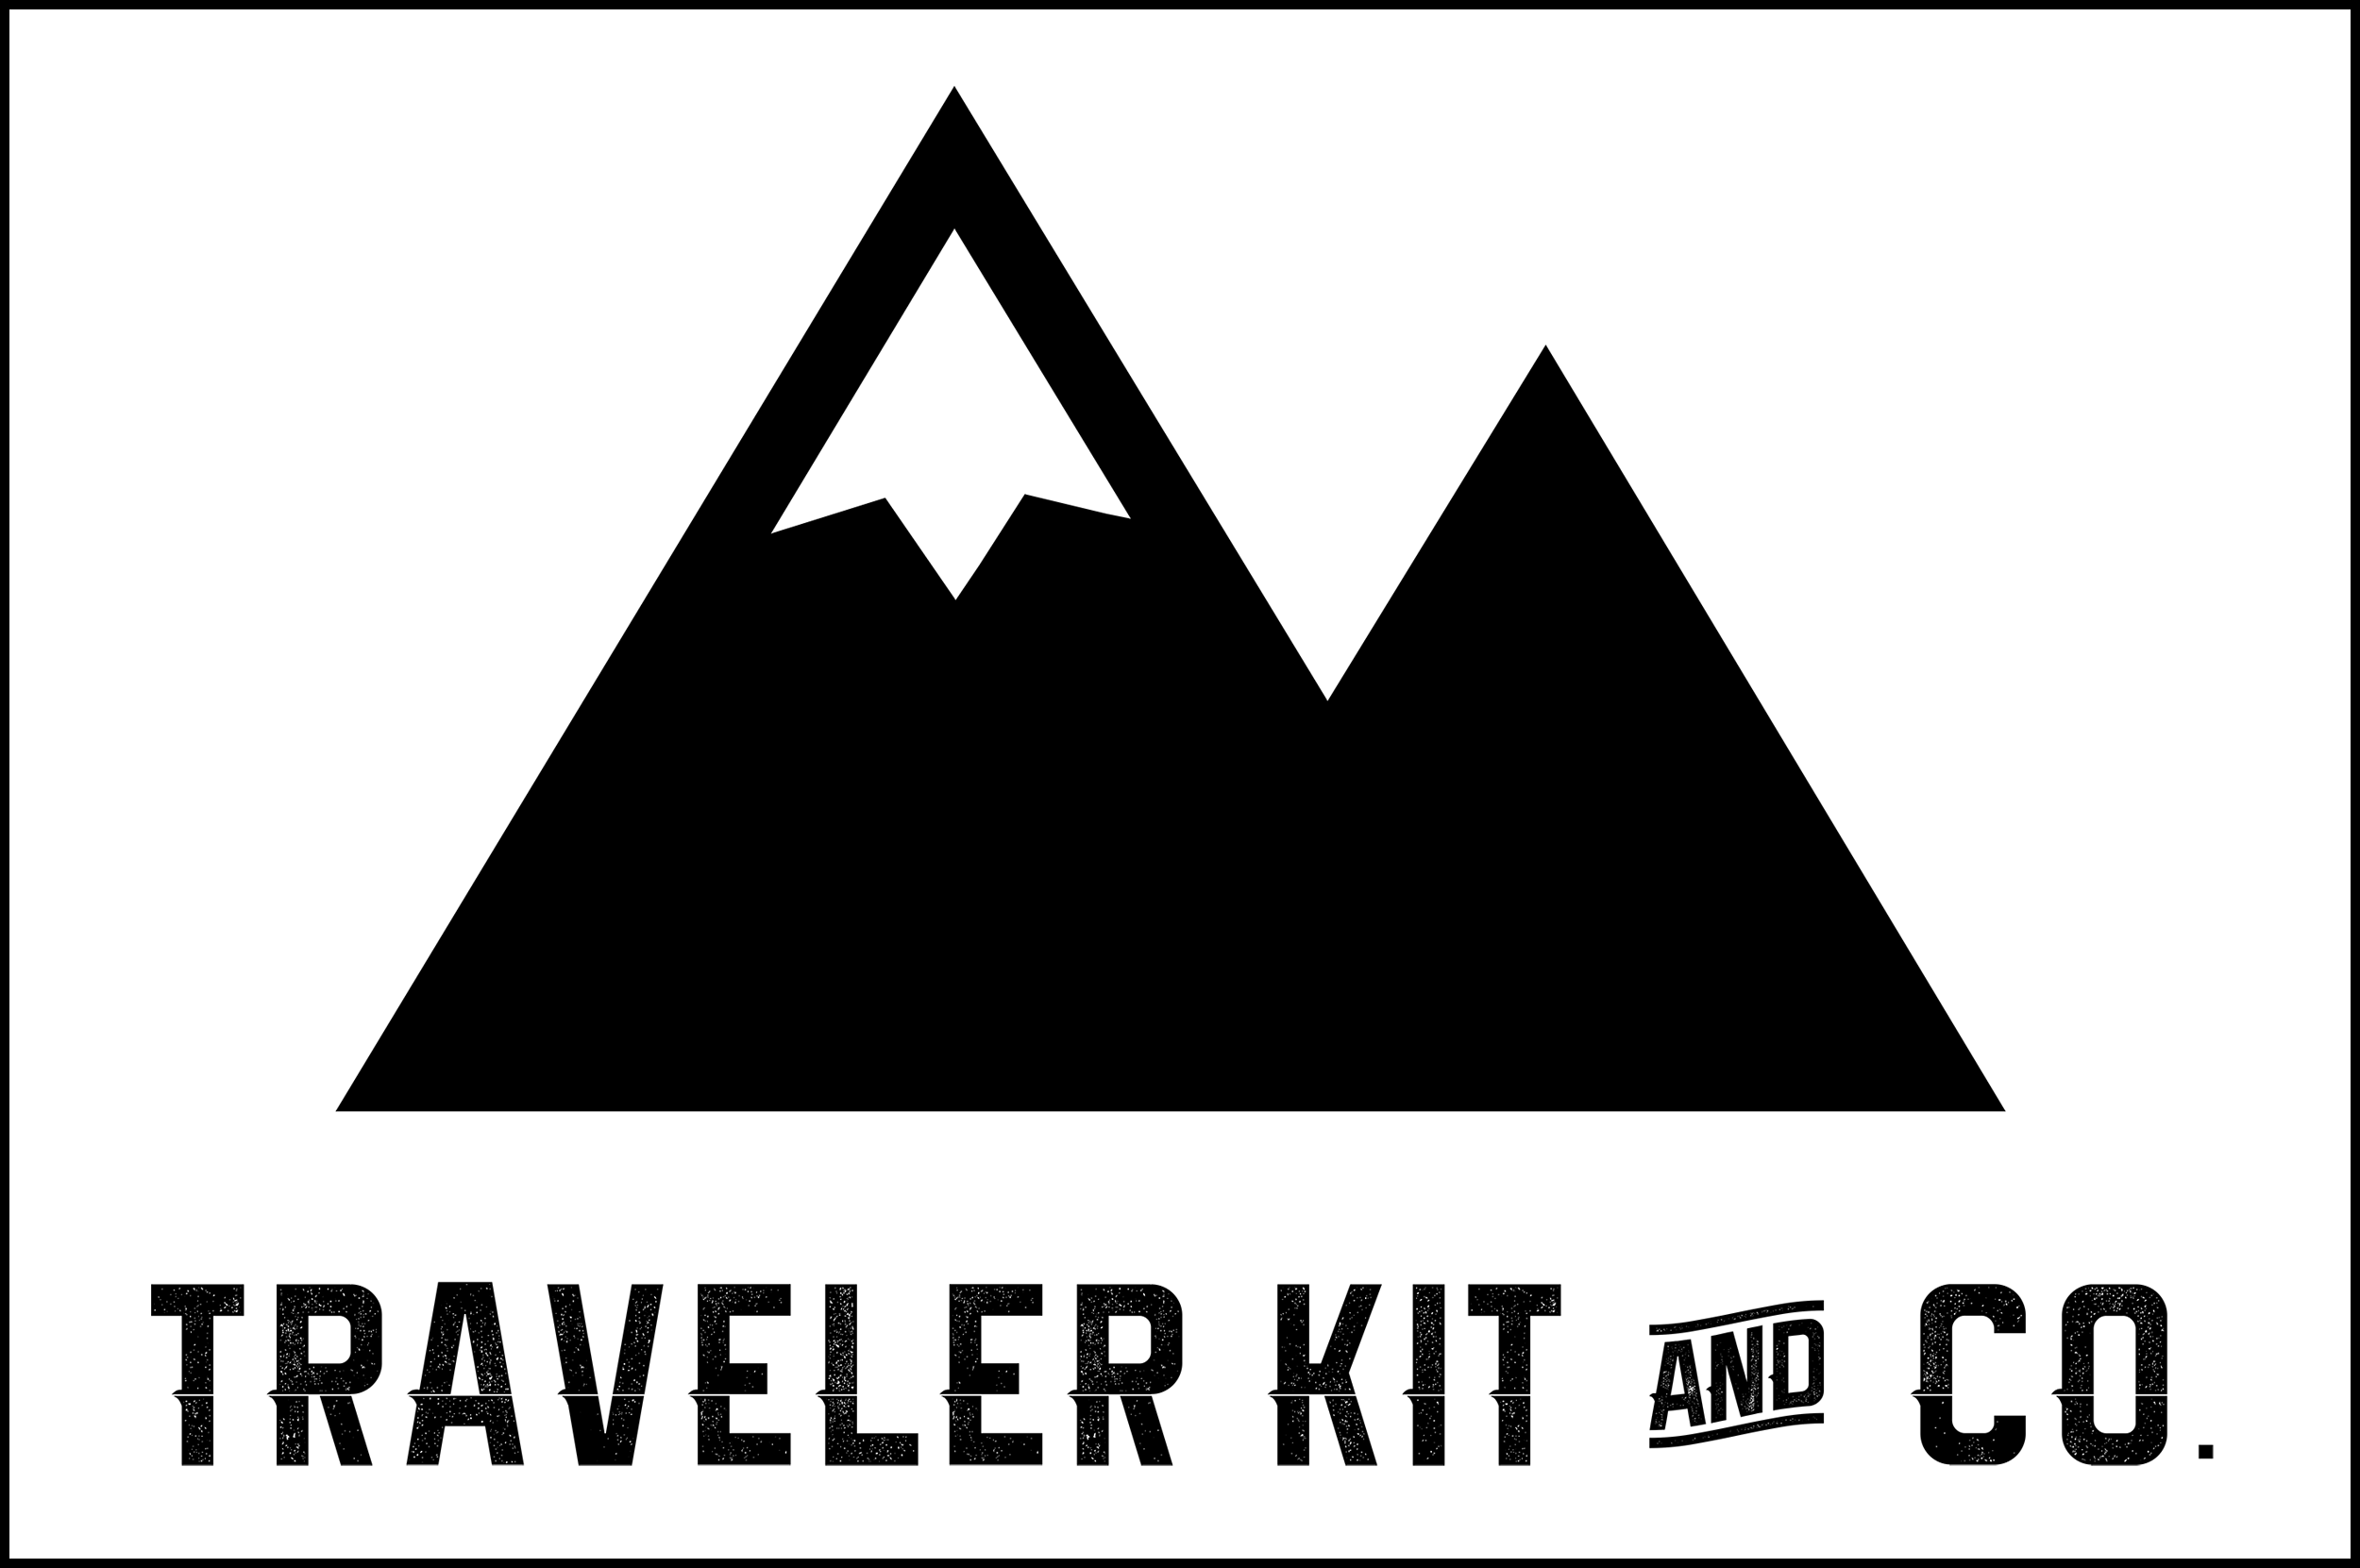 GeenaMatuson_TravelerKit-Logo.png